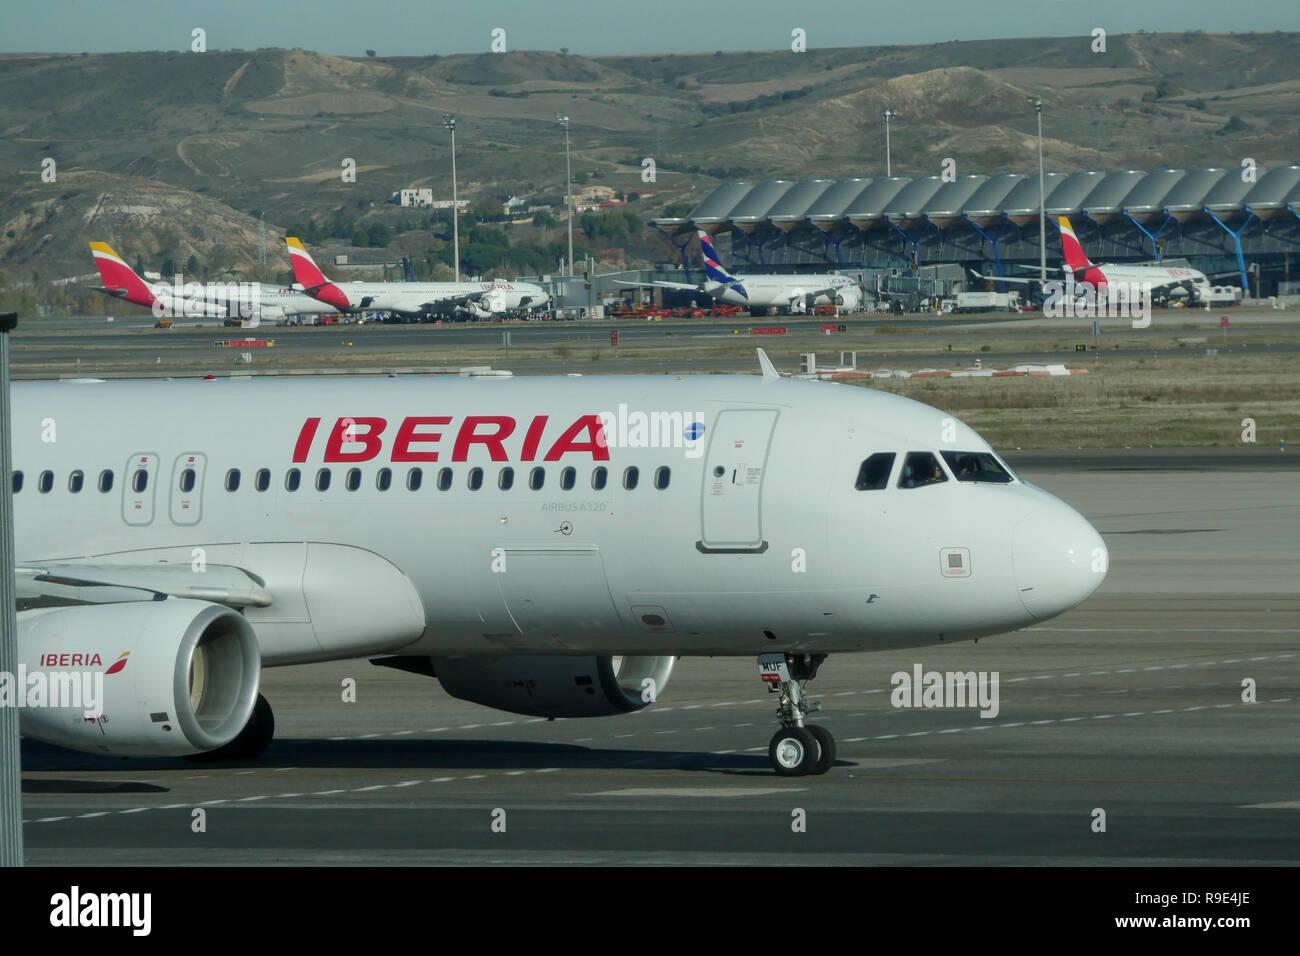 International Airport Adolfo Suárez Madrid-Barajas, Madrid, Spain Stock Photo